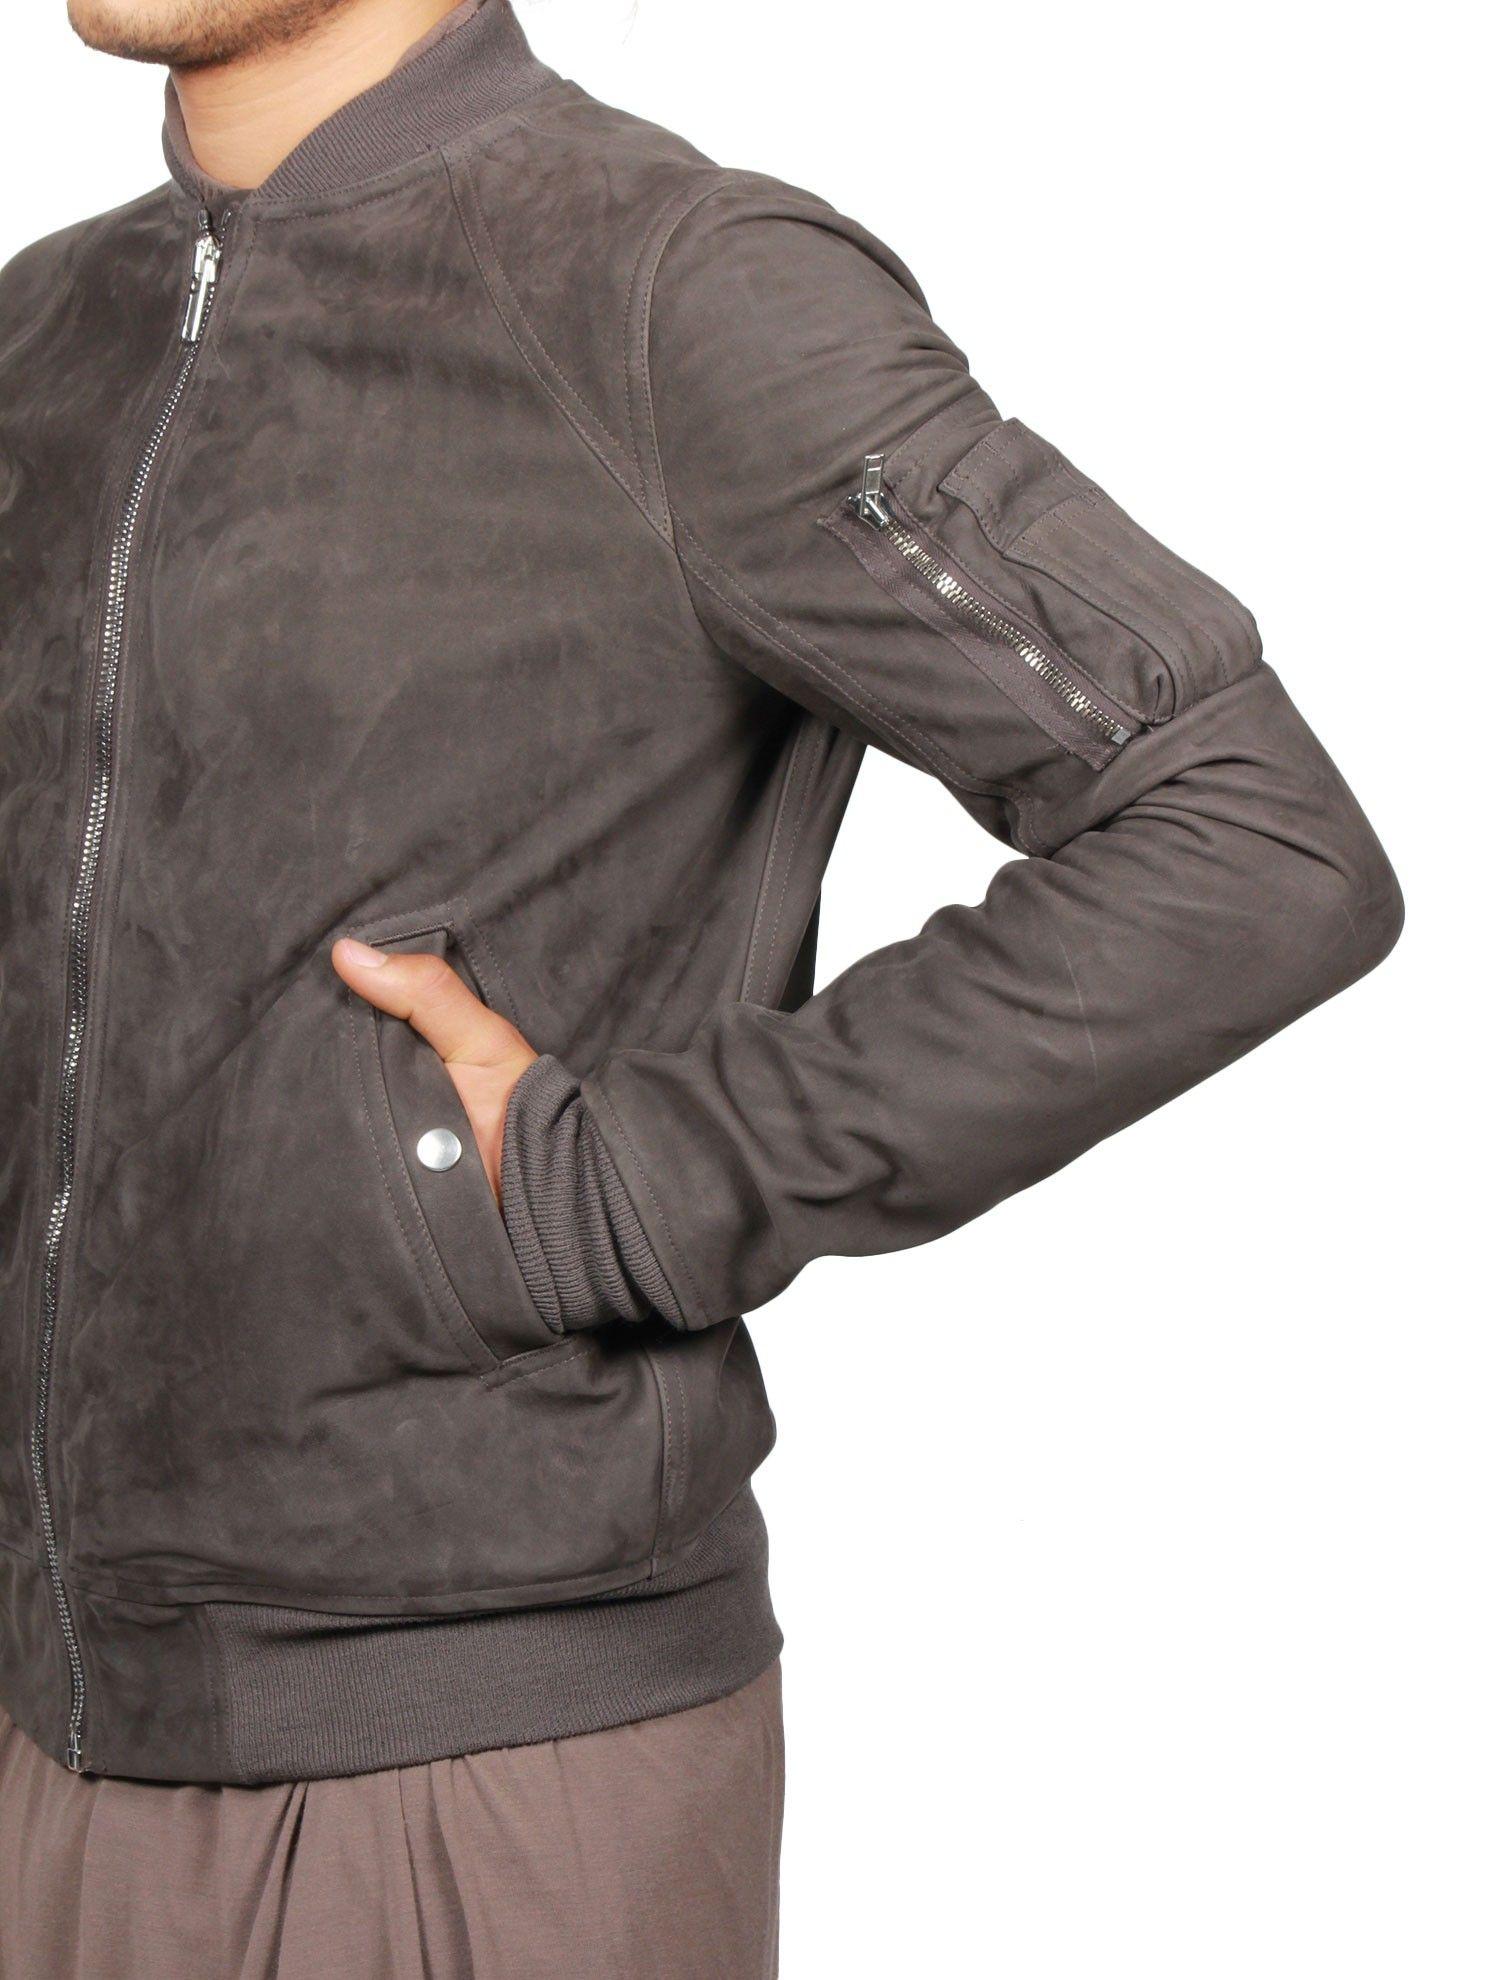 Veste cuir style rick owens